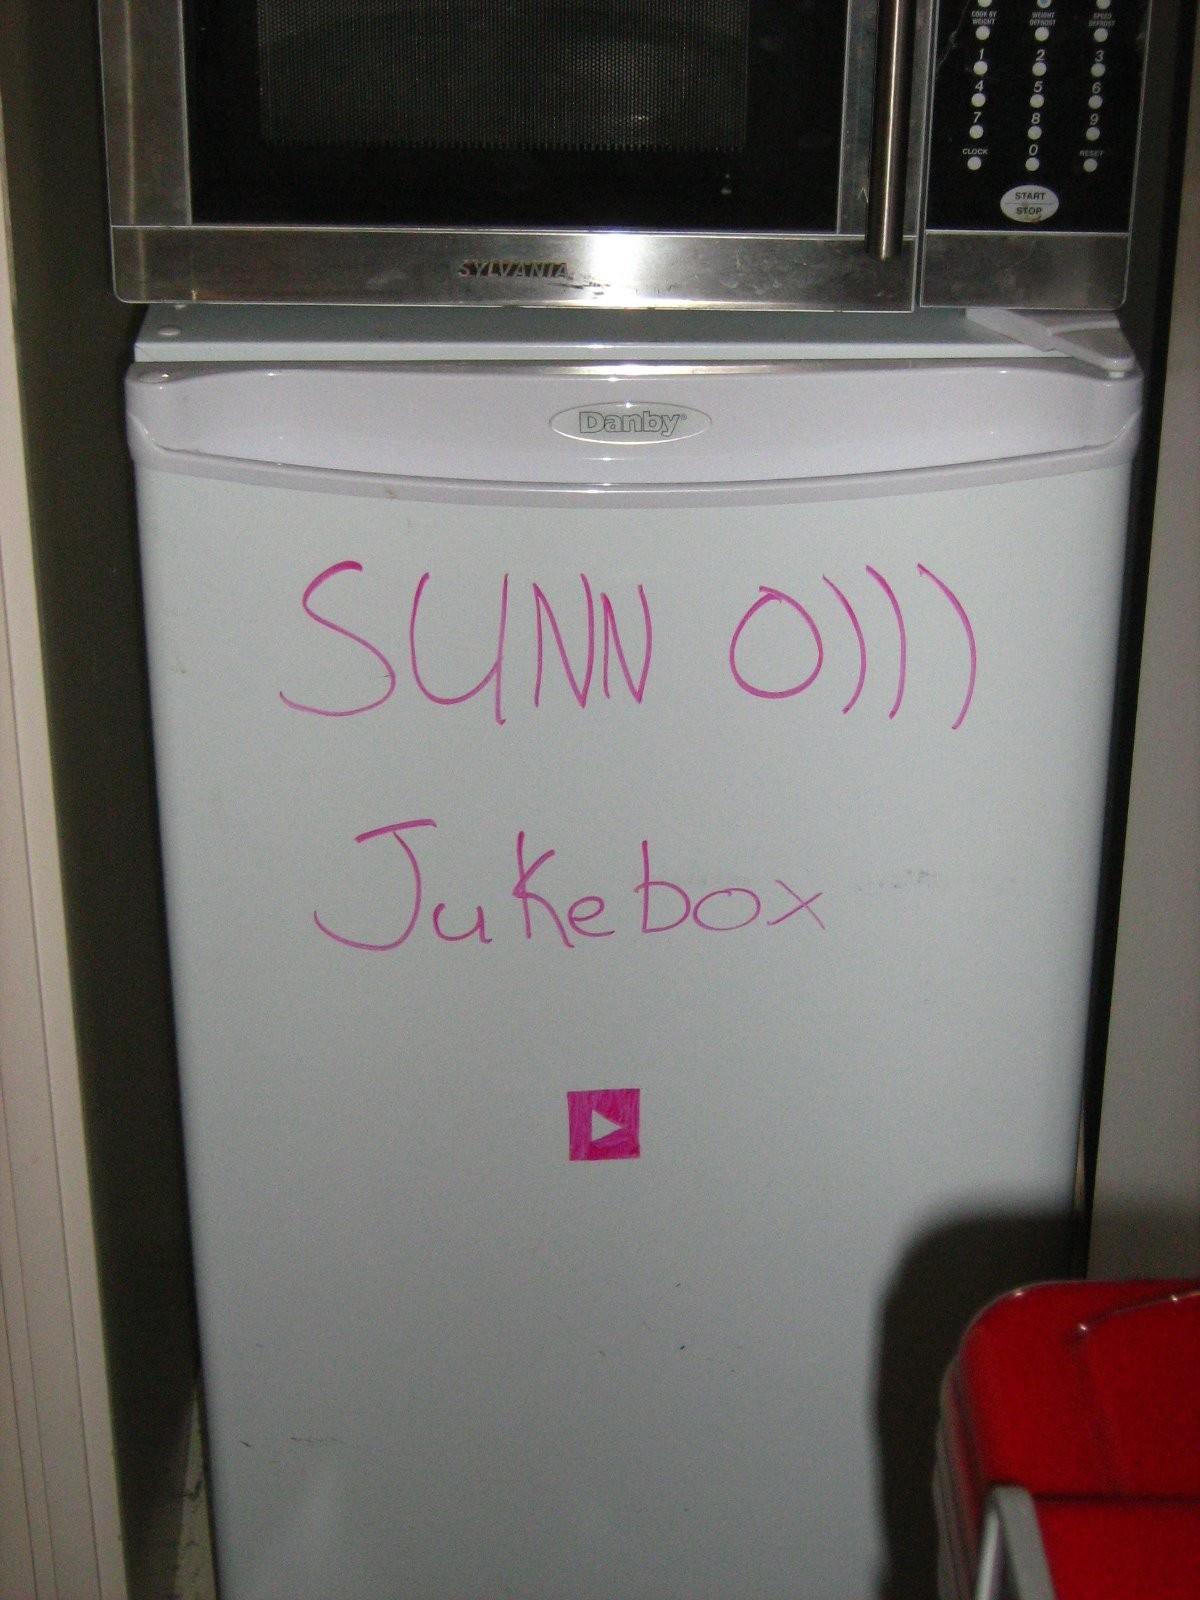 [Image: Sunn_o)))_jukebox.jpg]